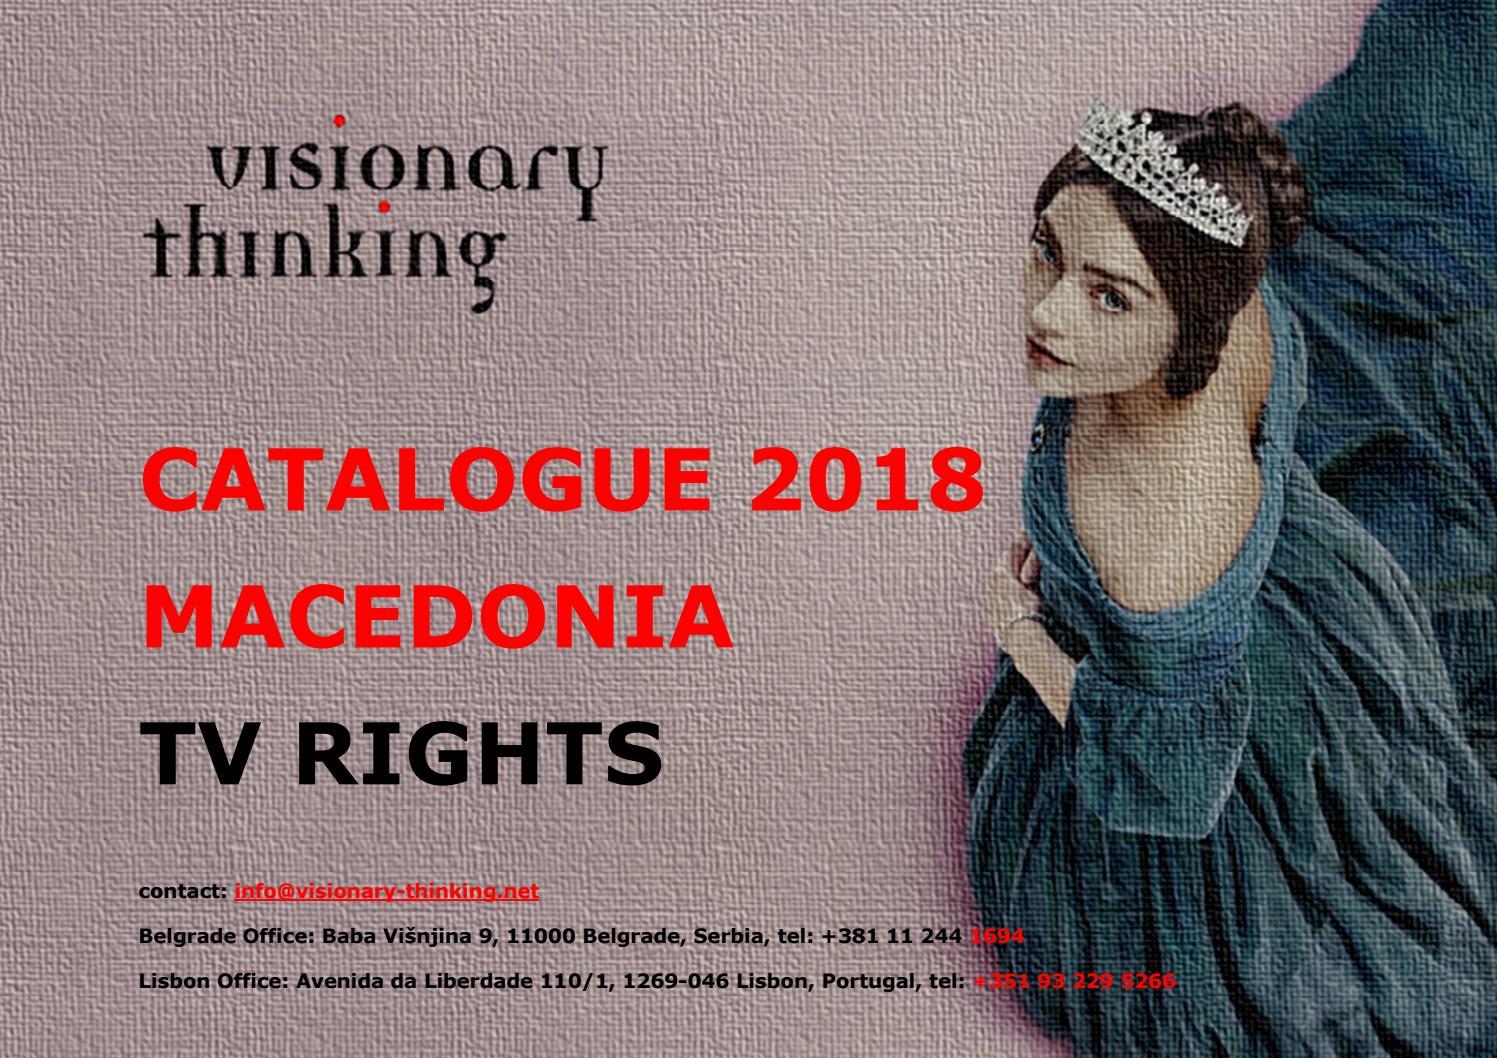 Kinky Dating Protestant Fling Spanish Divorced